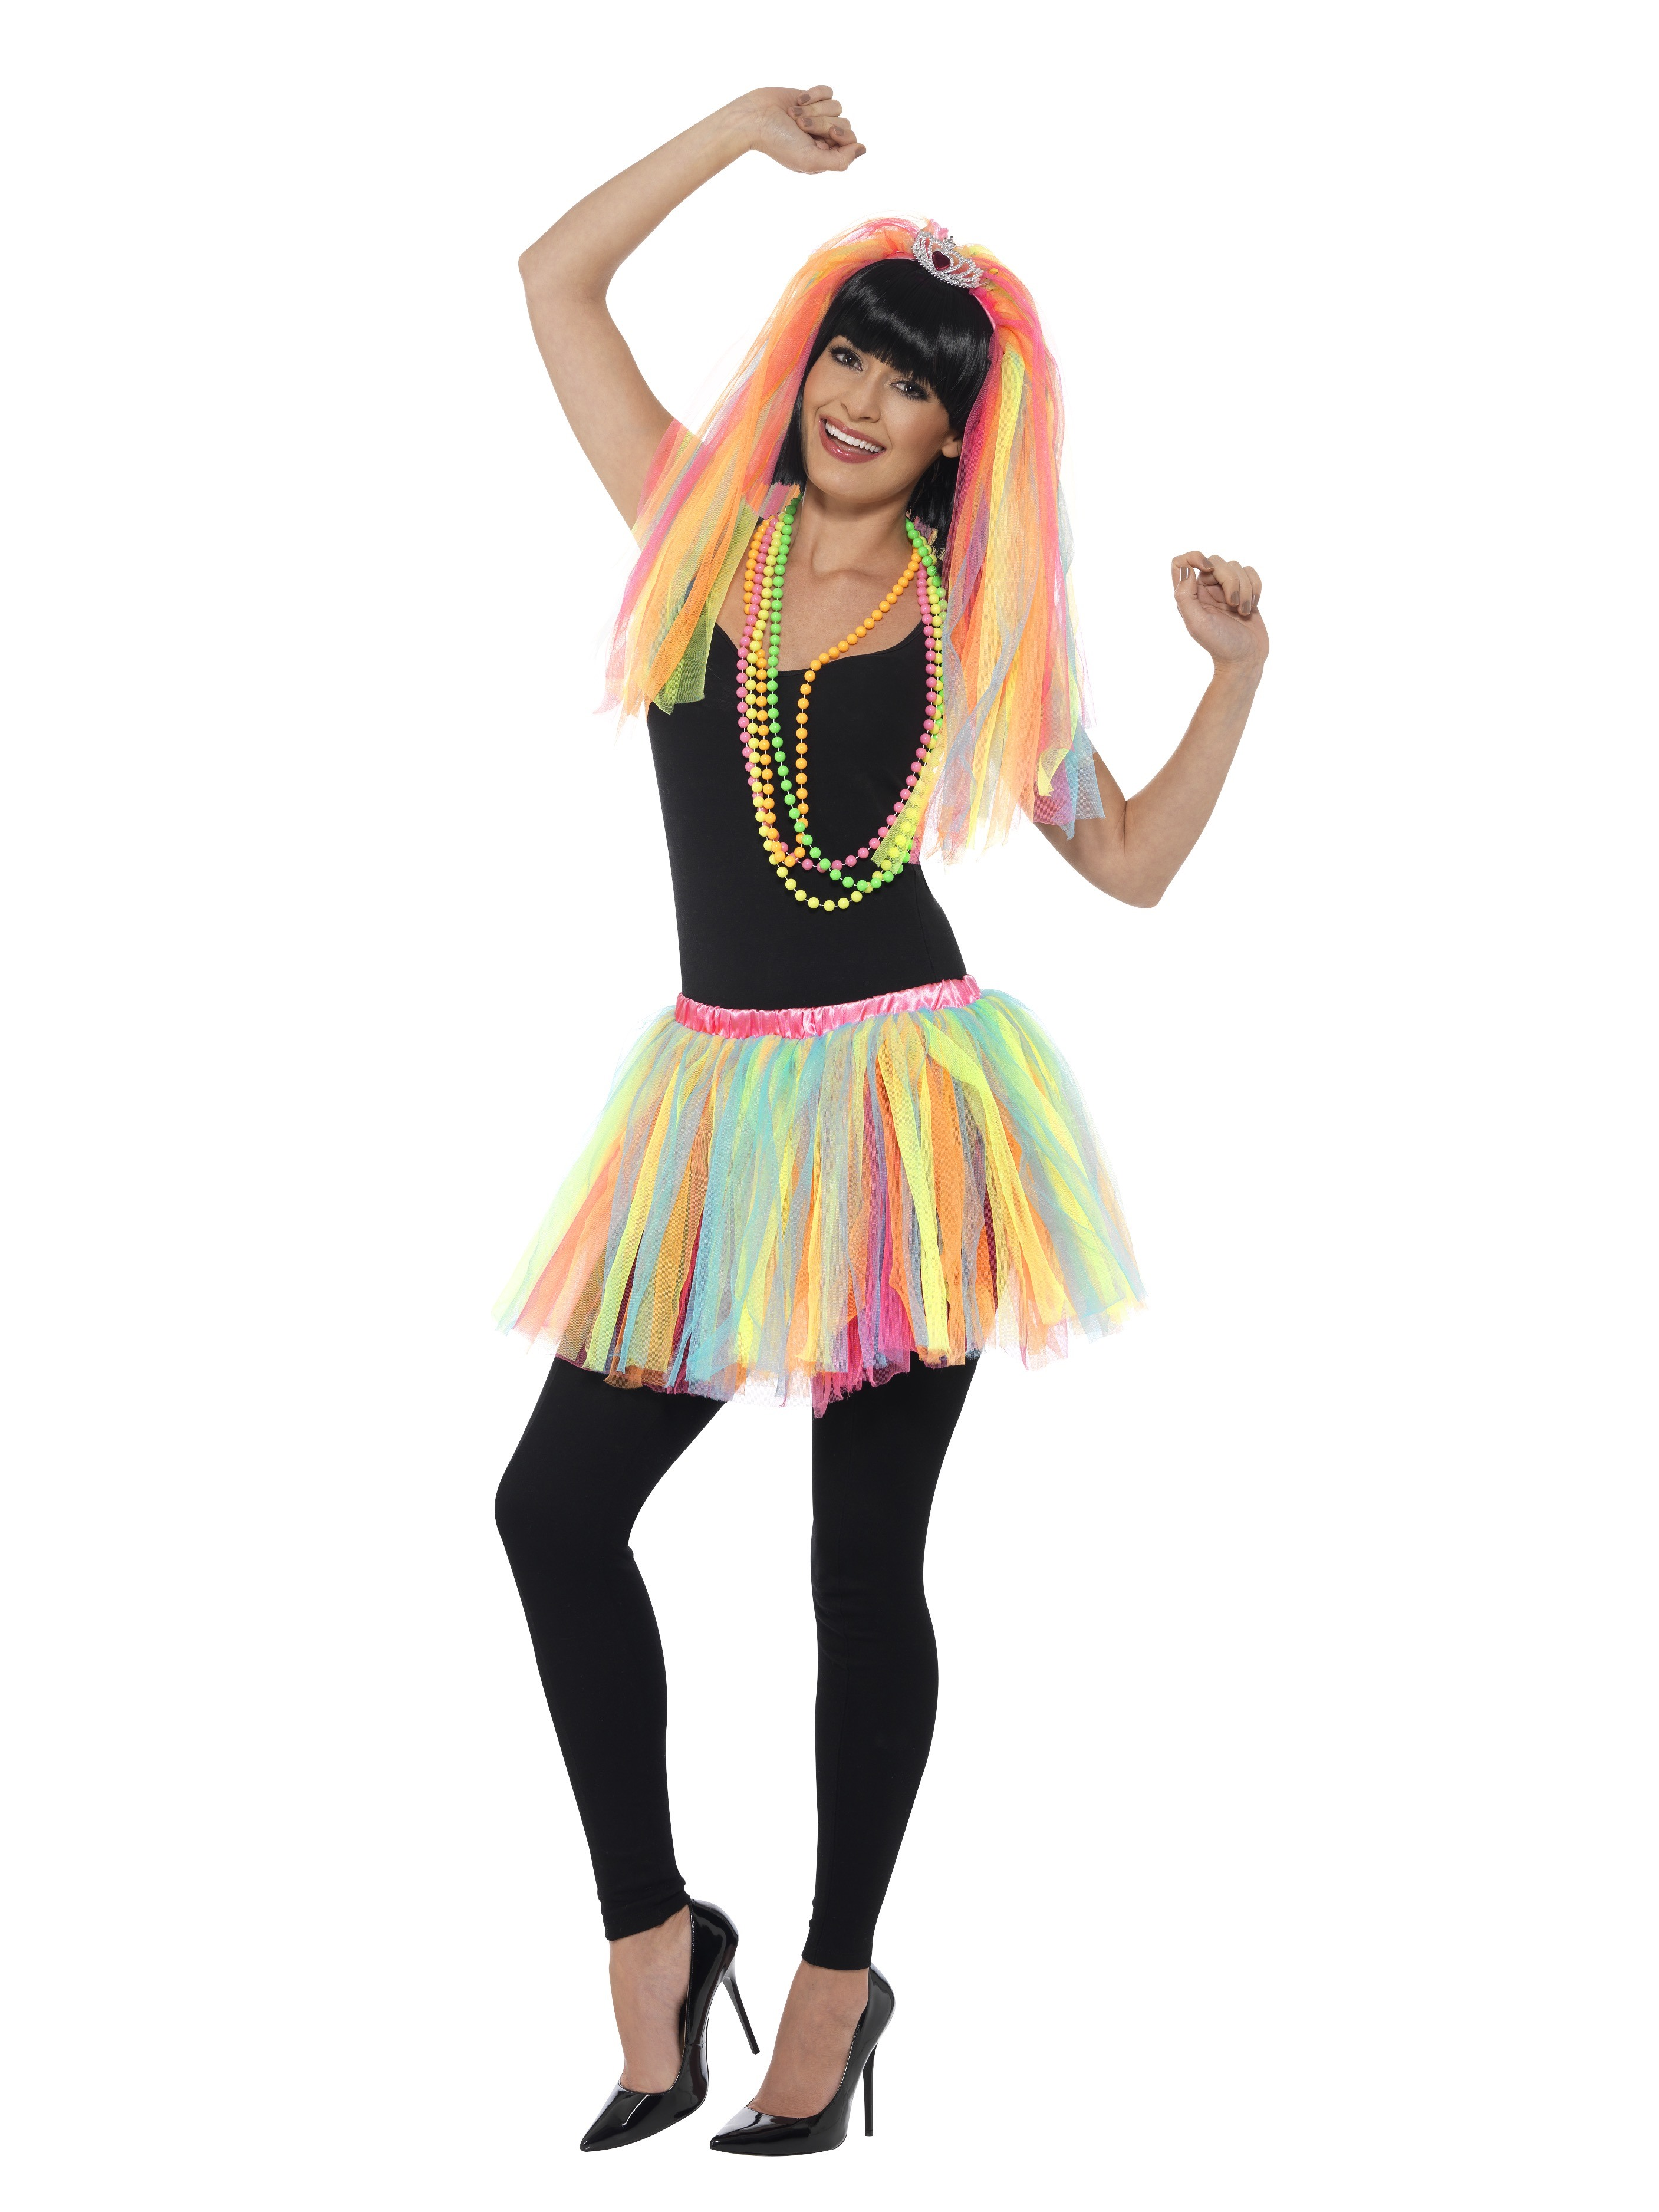 80-tals Partyprinsessa - Kit